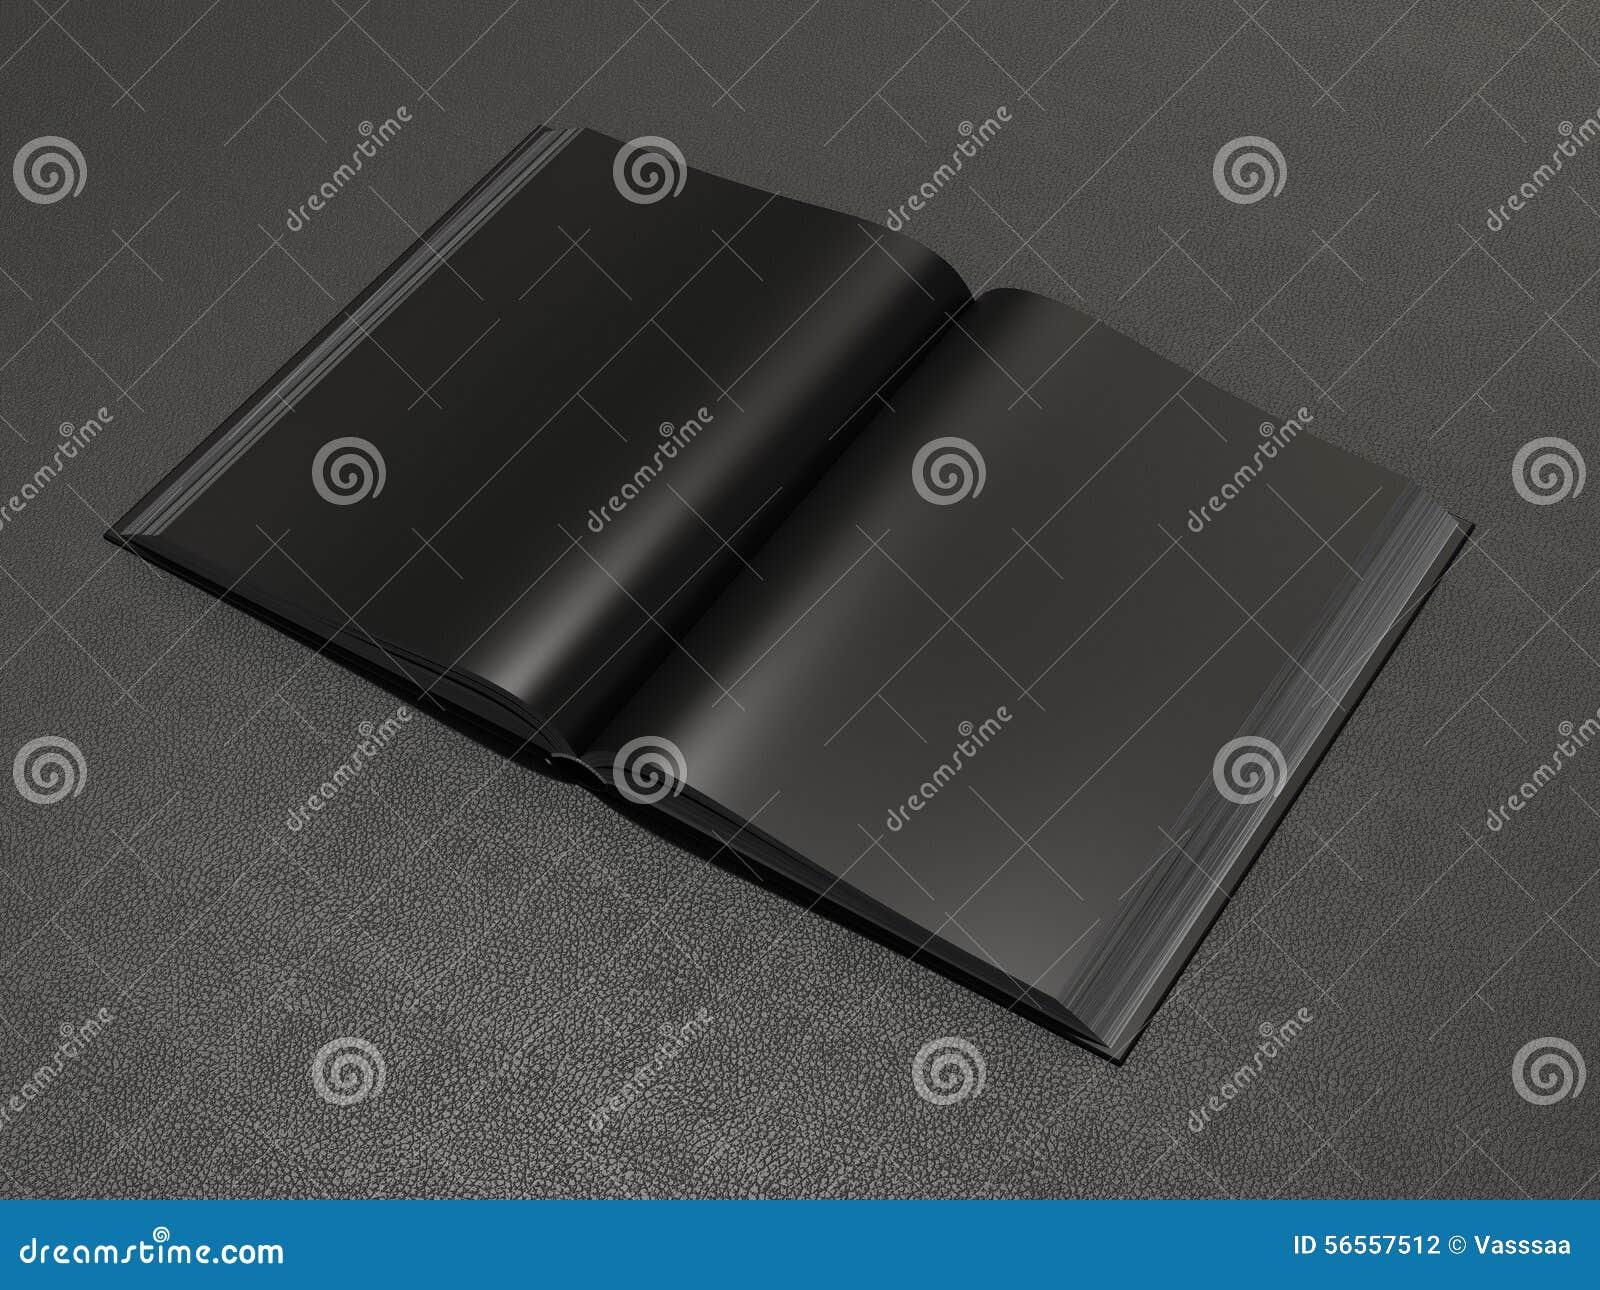 Download Ανοικτό μαύρο πρότυπο βιβλίων Απεικόνιση αποθεμάτων - εικονογραφία από σκοτεινός, ιδέα: 56557512